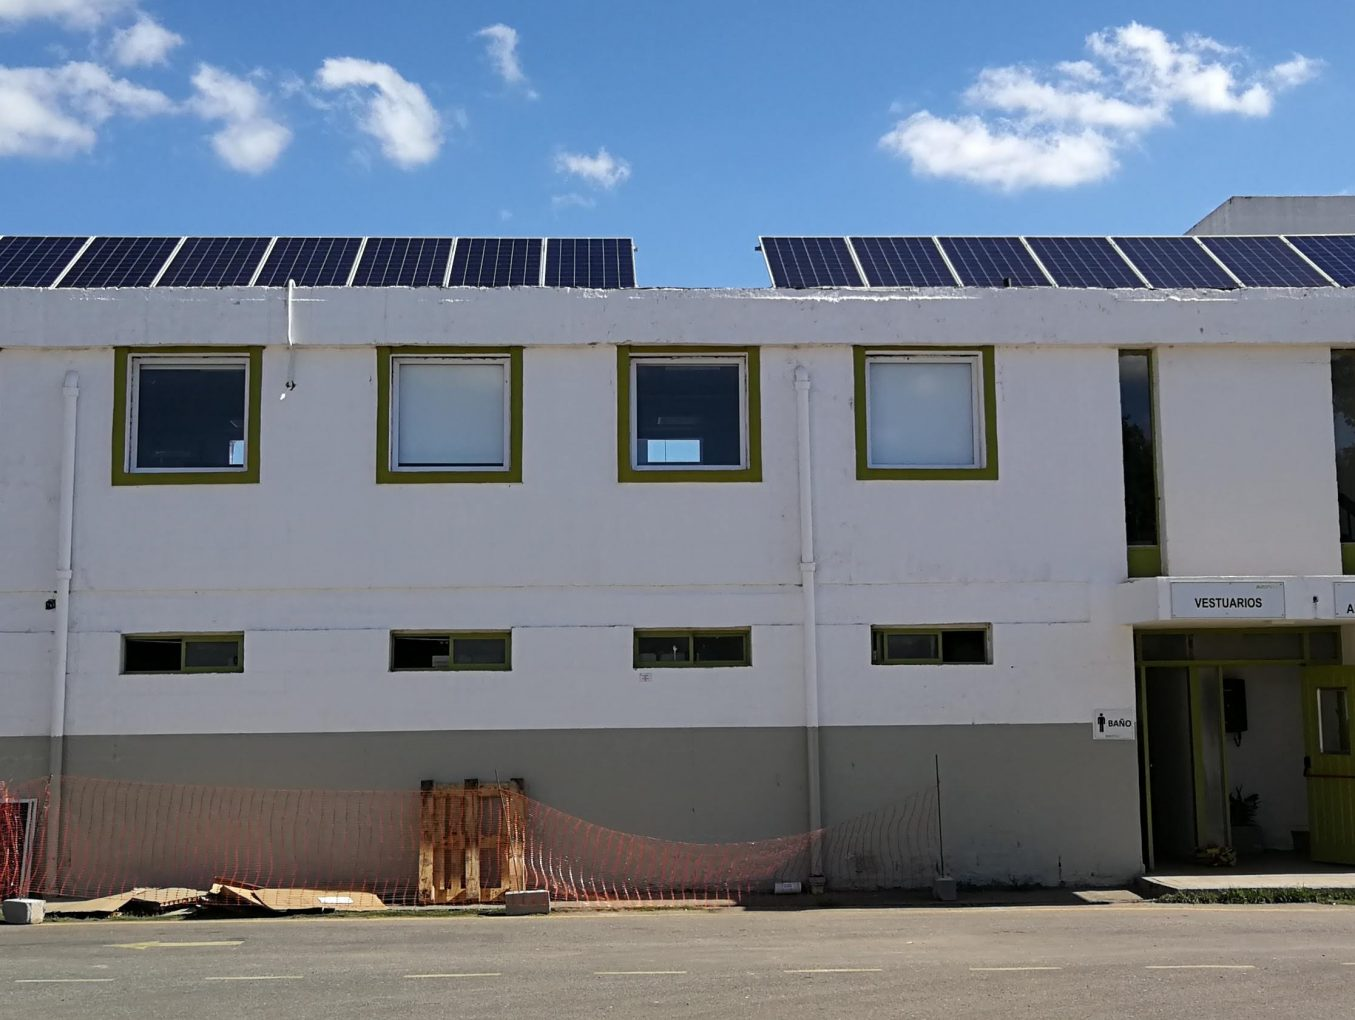 La autopartista Autoneum instala un sistema fotovoltaico